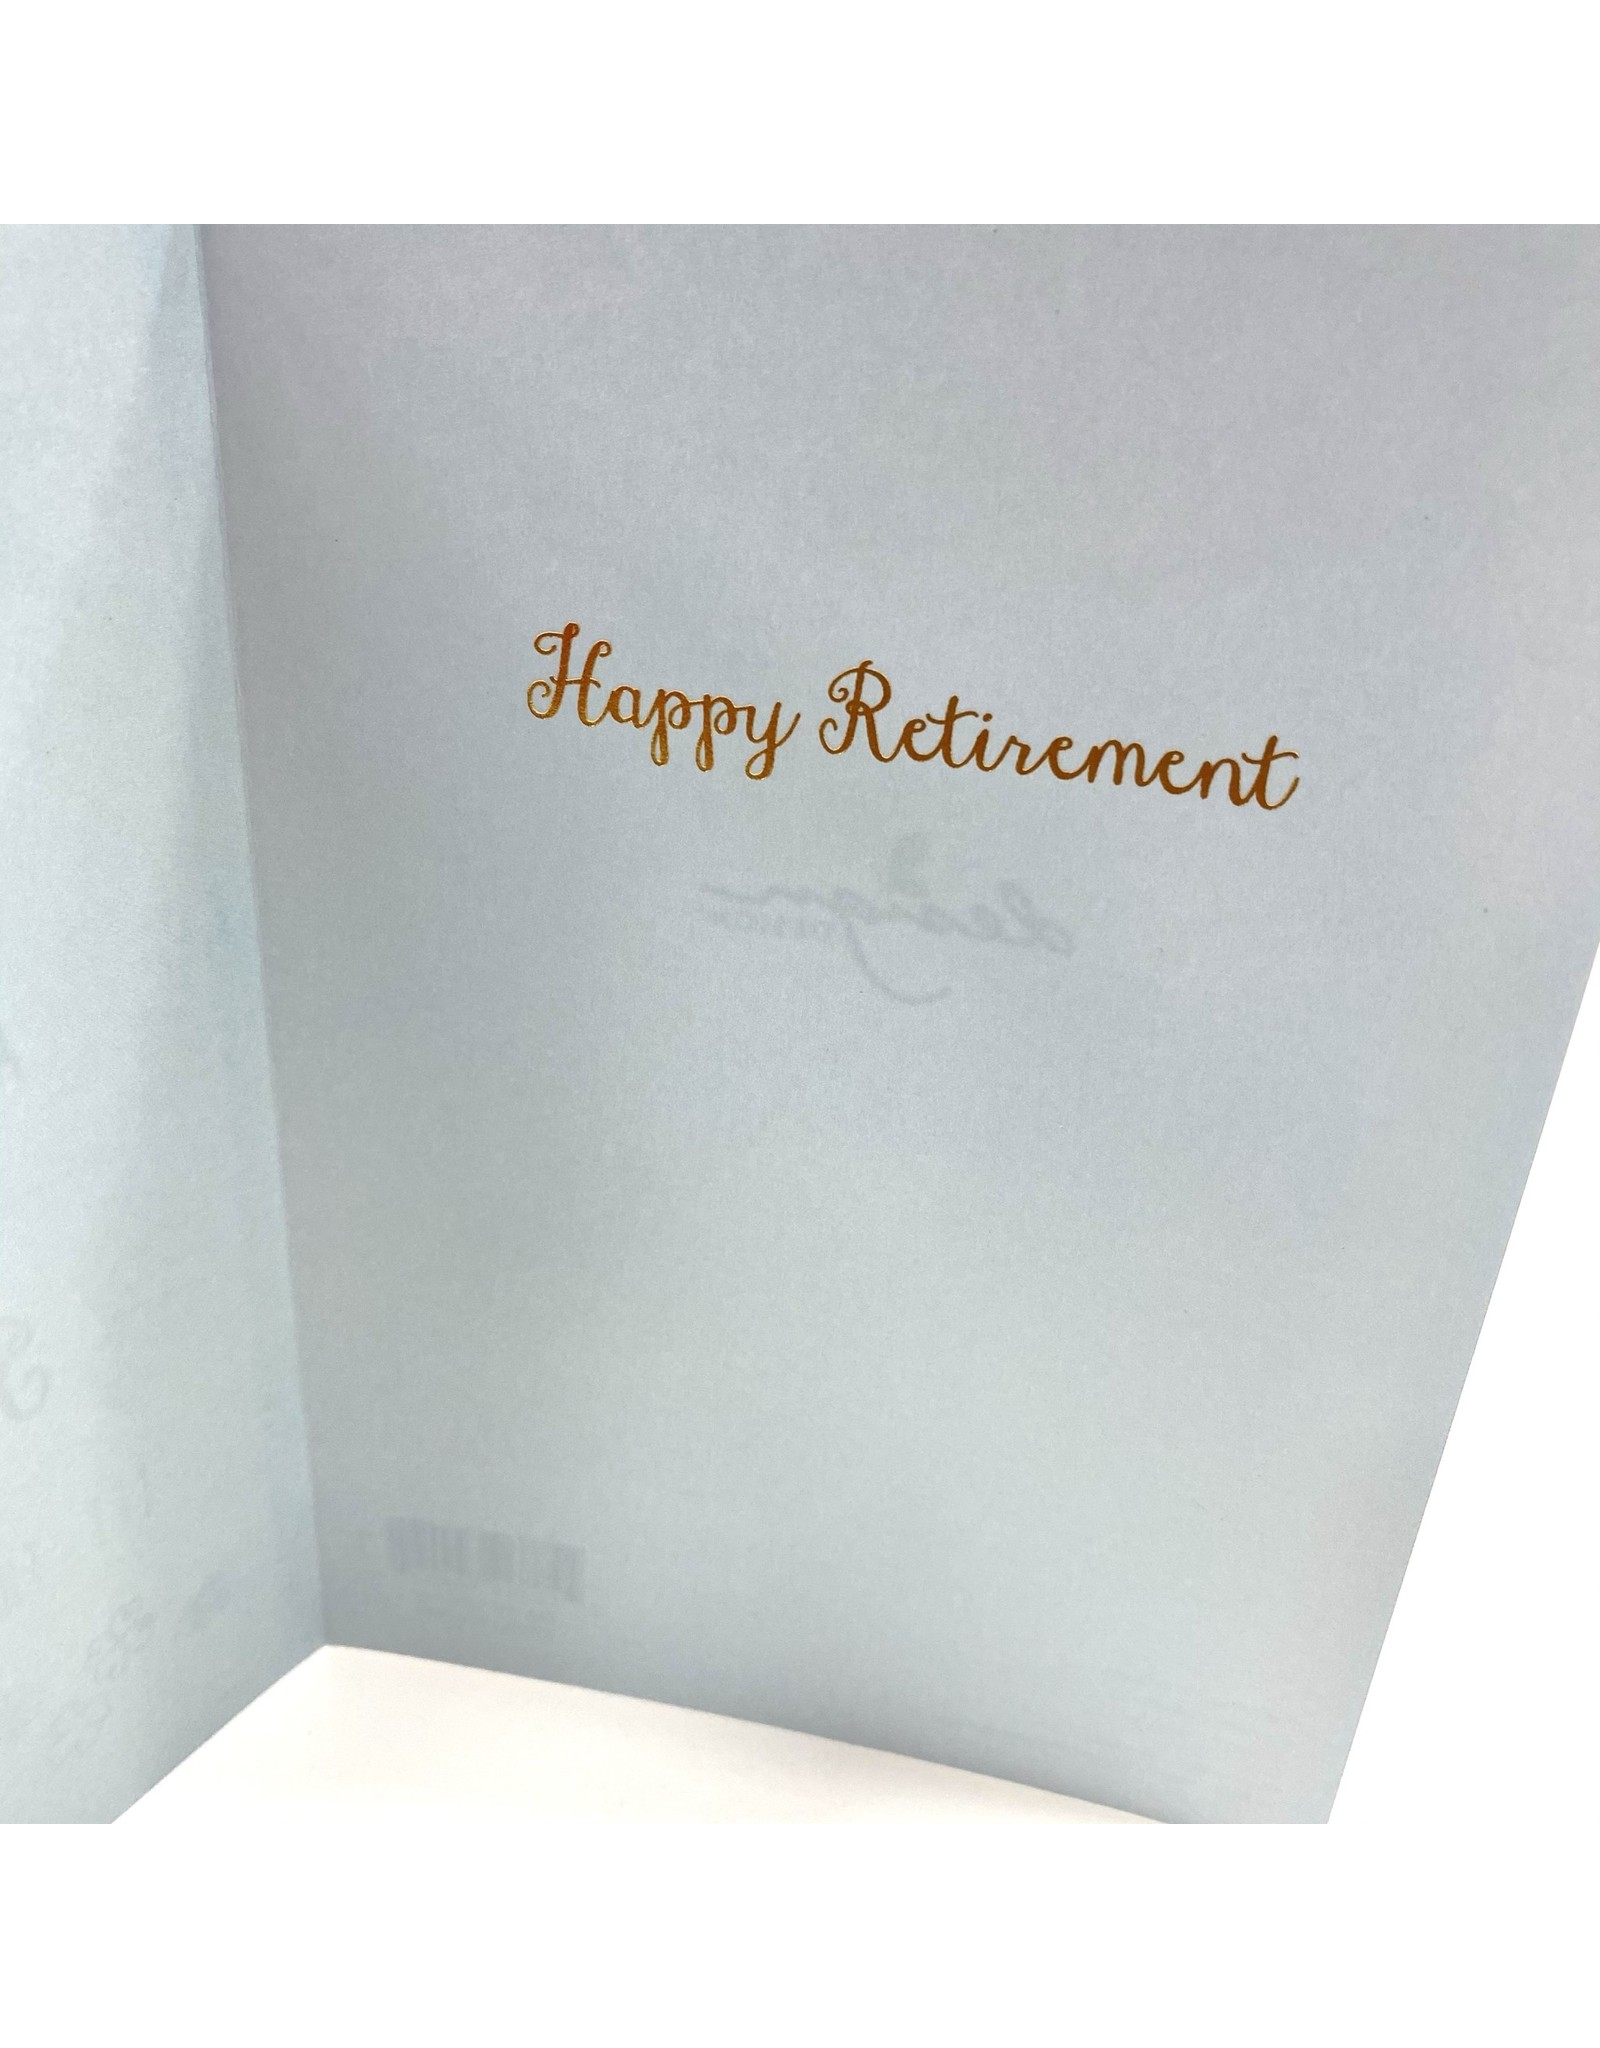 Design Design Greeting Card - Retirement